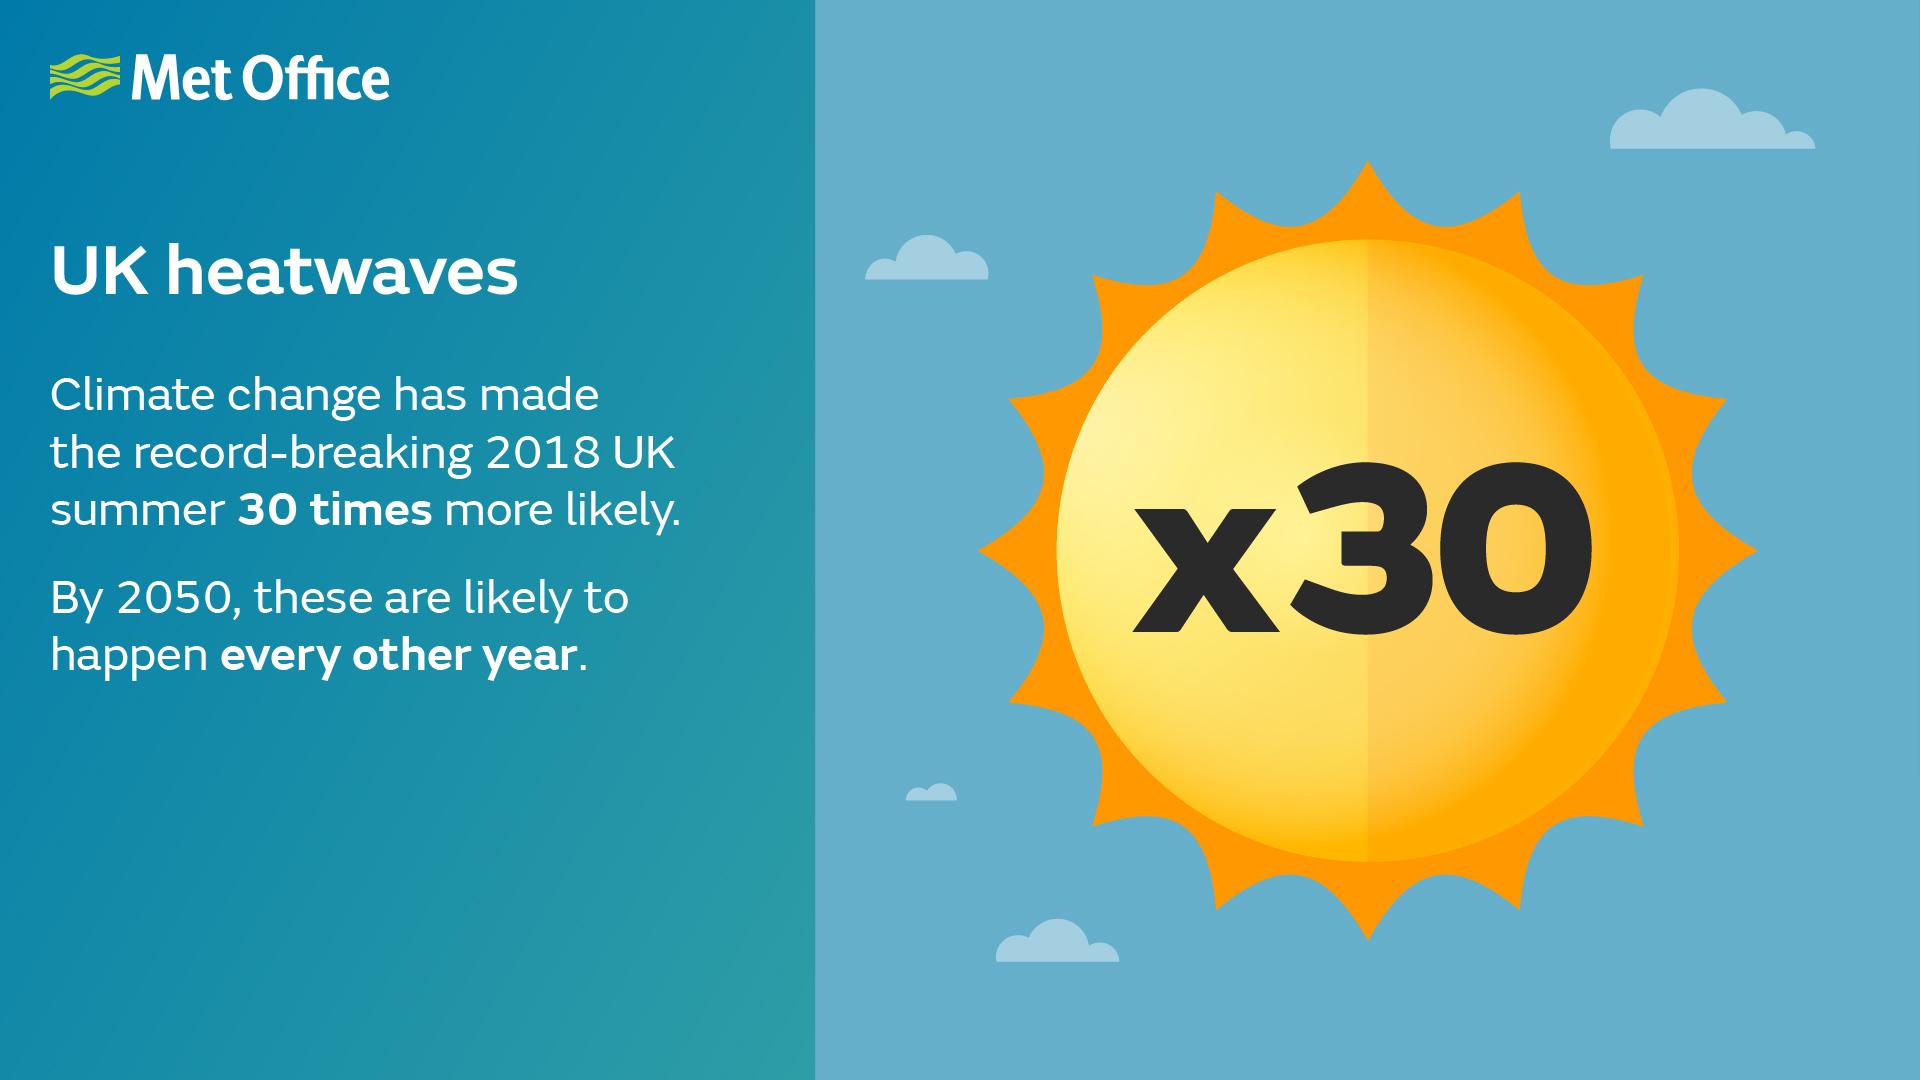 UK heatwaves - July 2019